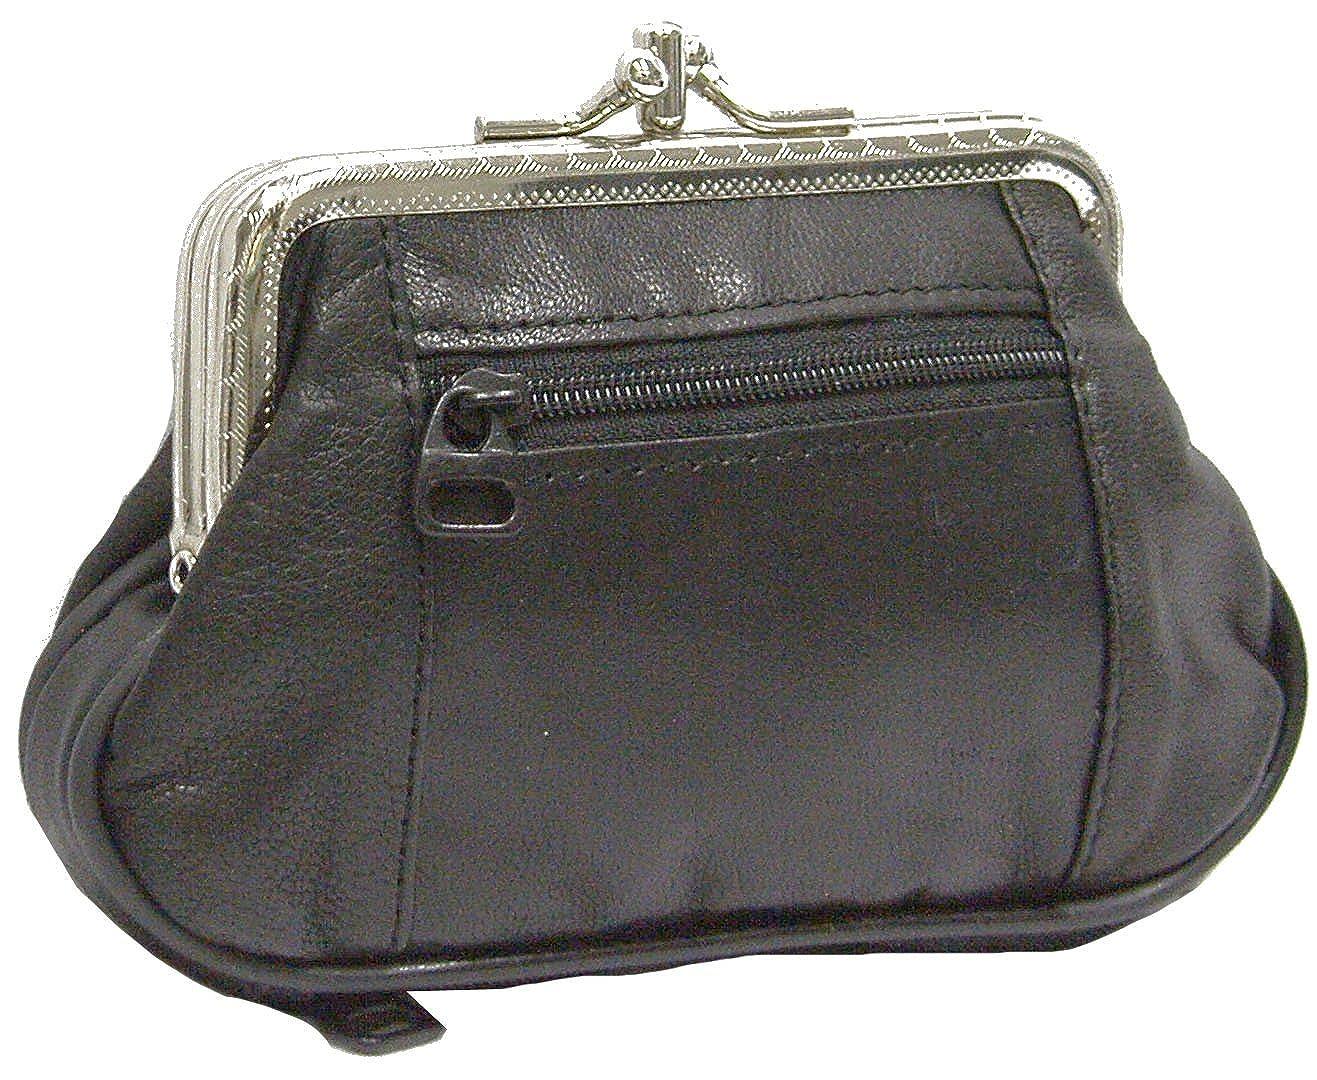 Leather Coin Purse Kiss Lock Framed Mini Wallet Credit Card Holder Case  Organizer (Black) at Amazon Women s Clothing store  7783da4cc8327